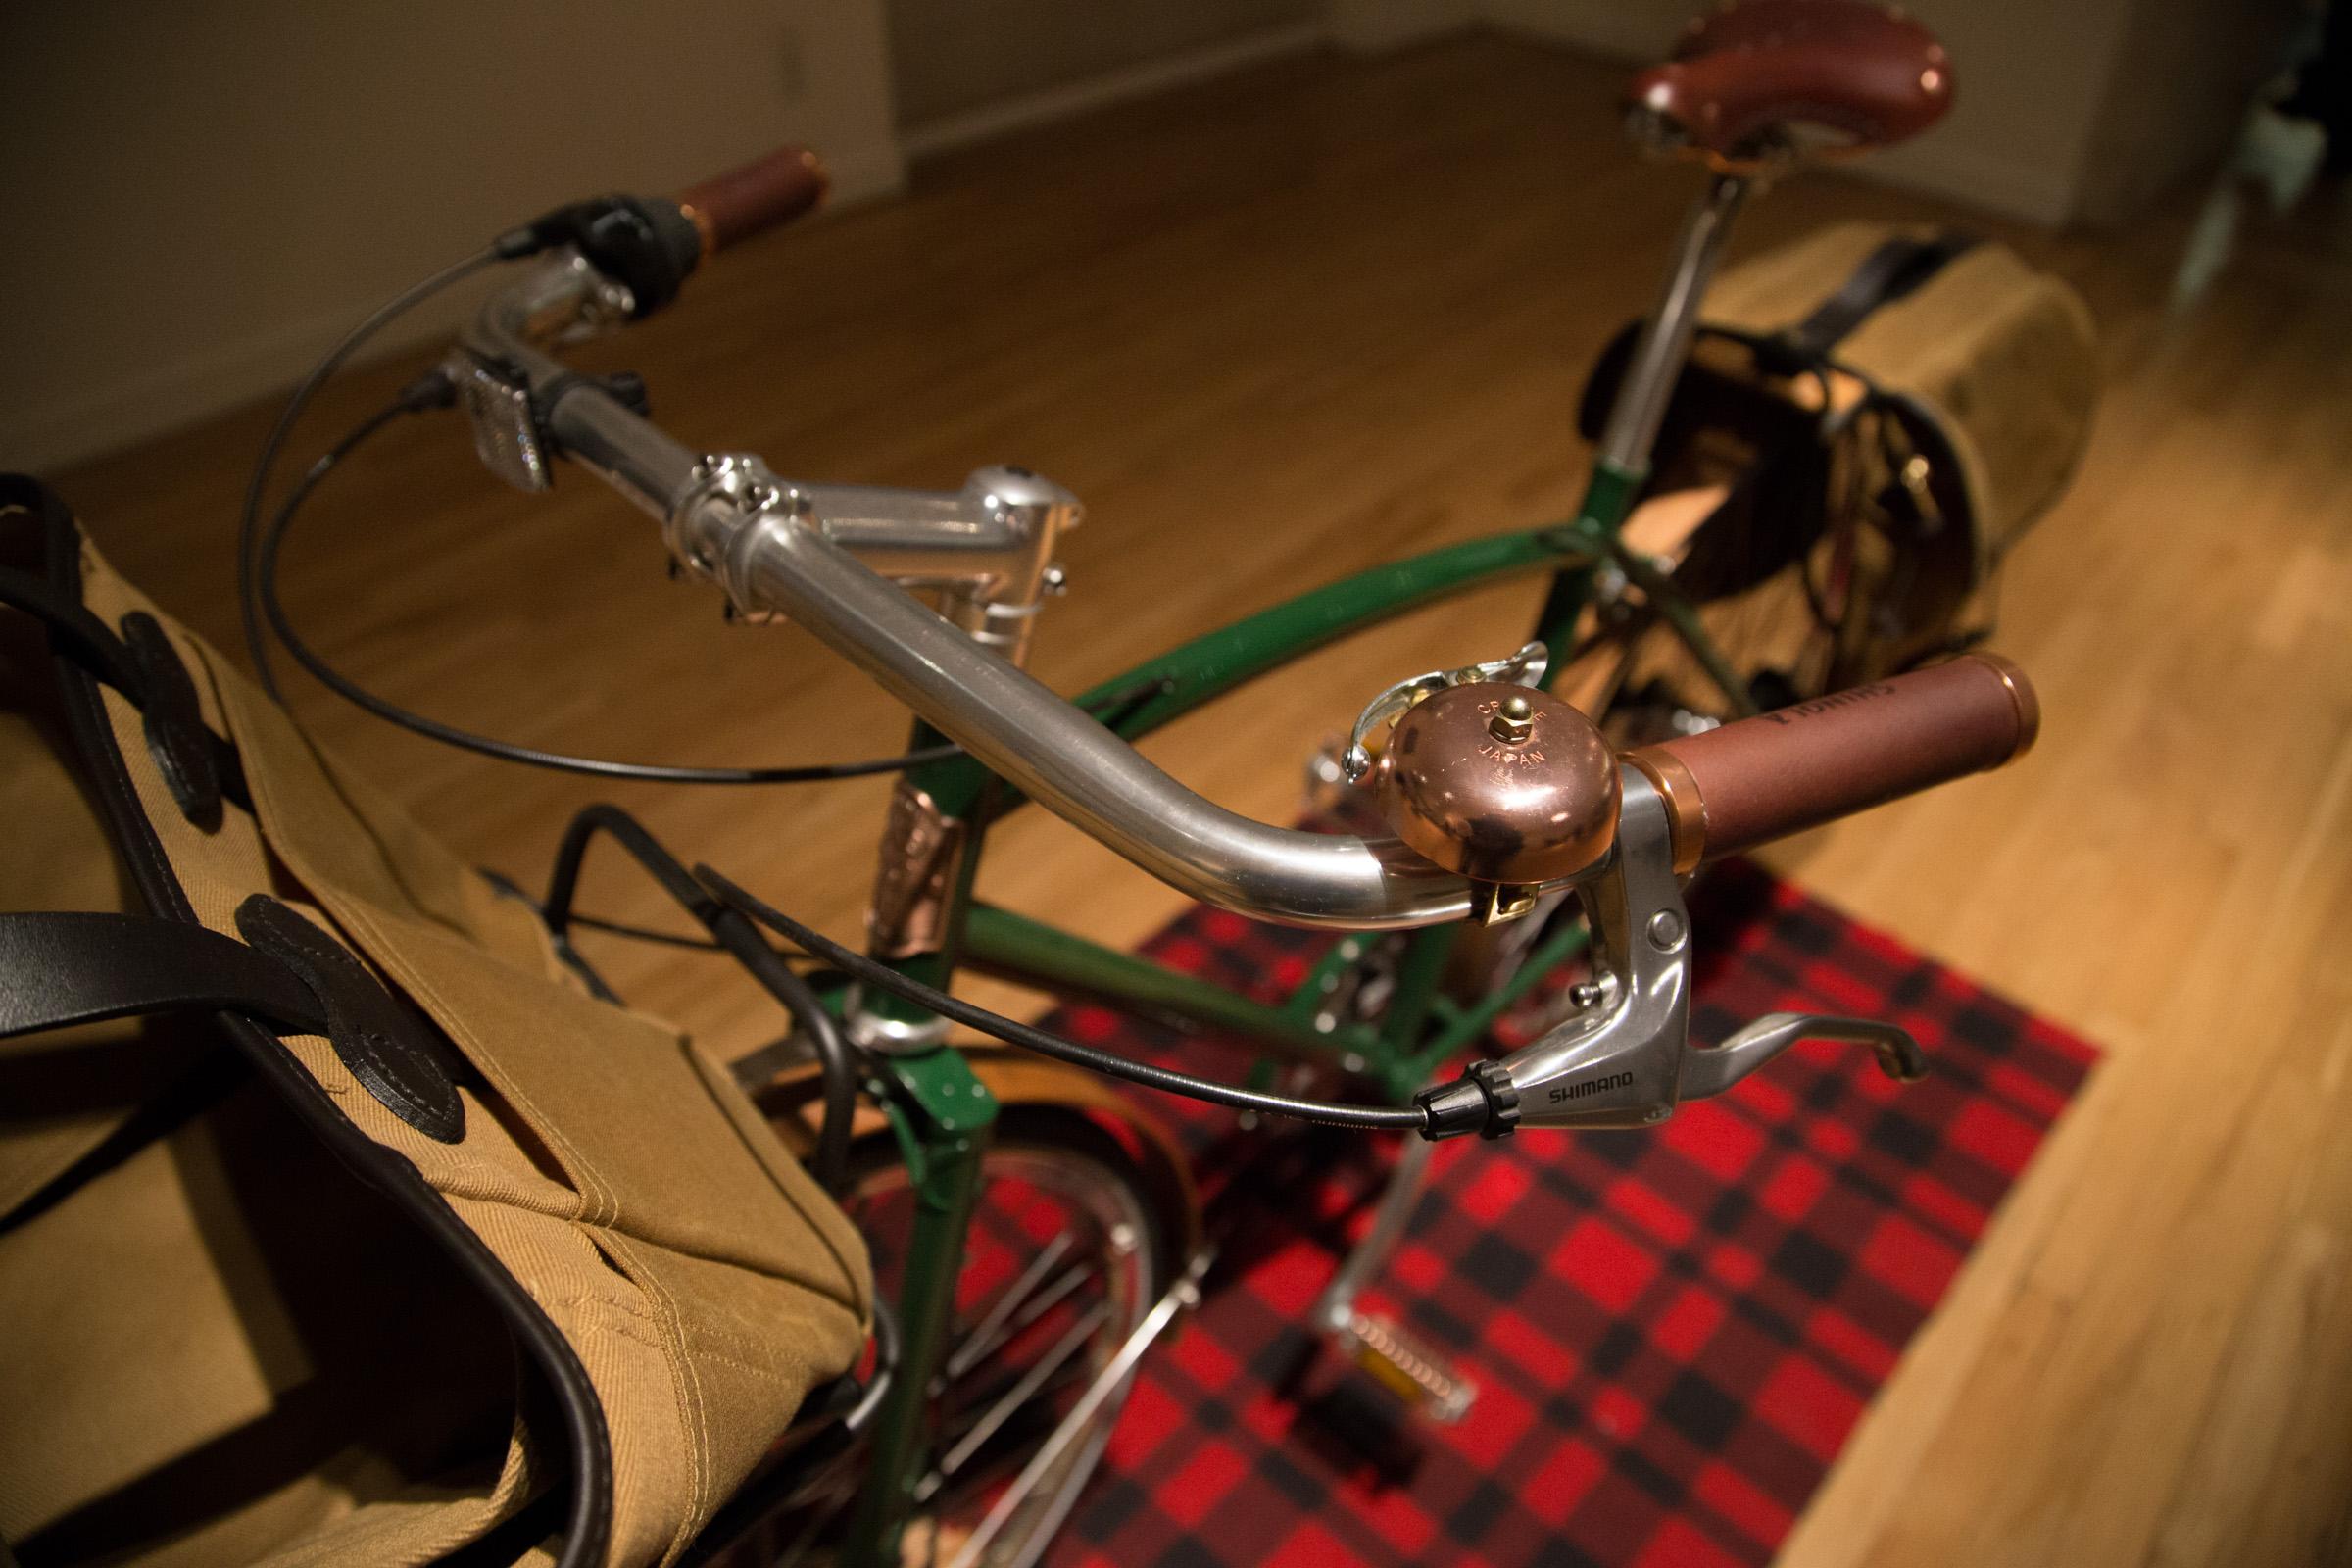 Filson Bicycle